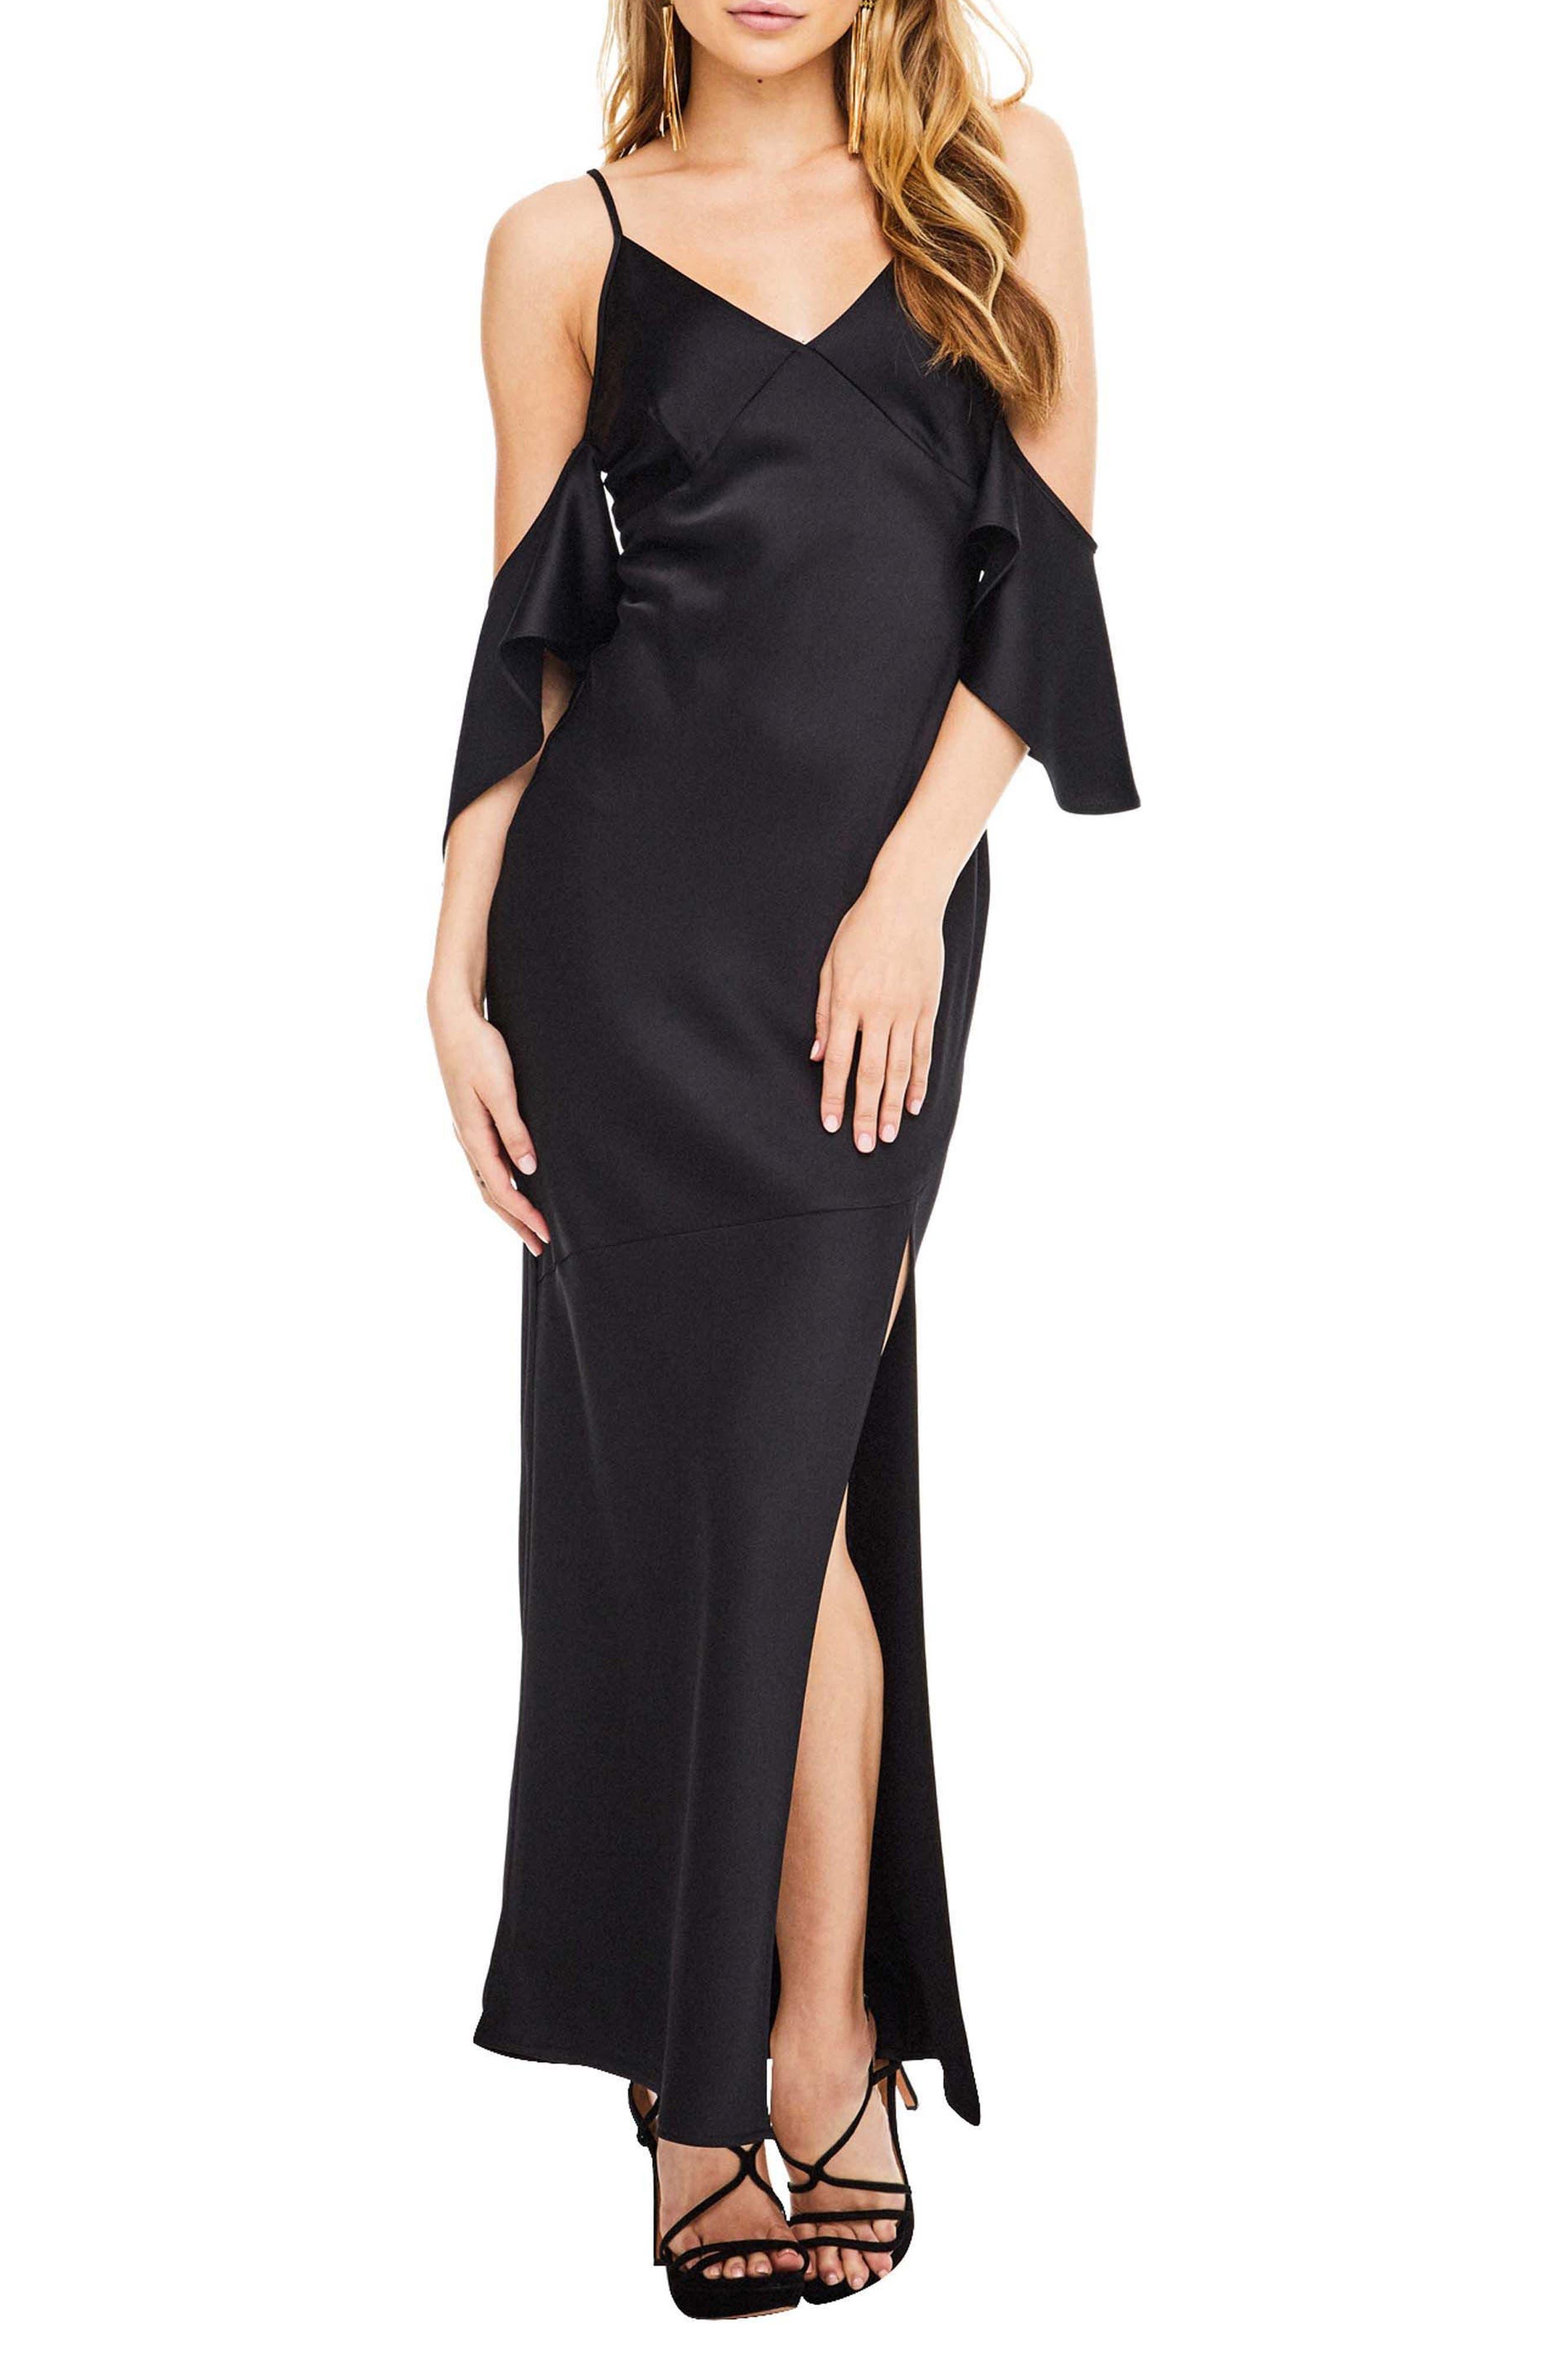 Kendra Maxi Dress,                             Main thumbnail 1, color,                             001